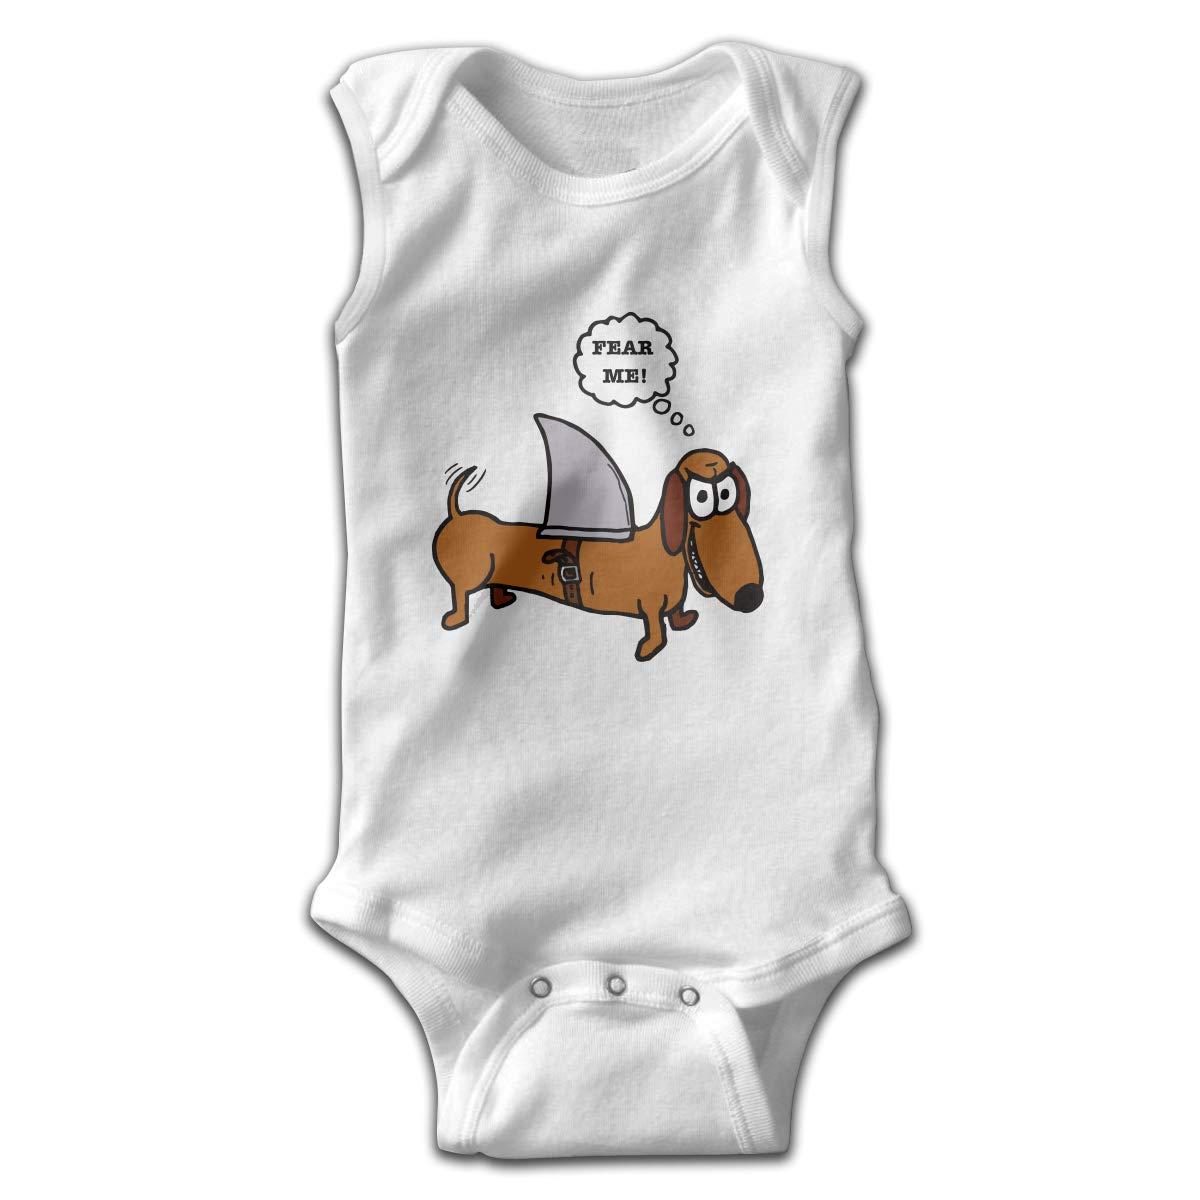 Weiner Dog with A Sharks Fin Newborn Crawling Suit Sleeveless Romper Bodysuit Onesies Jumpsuit Black